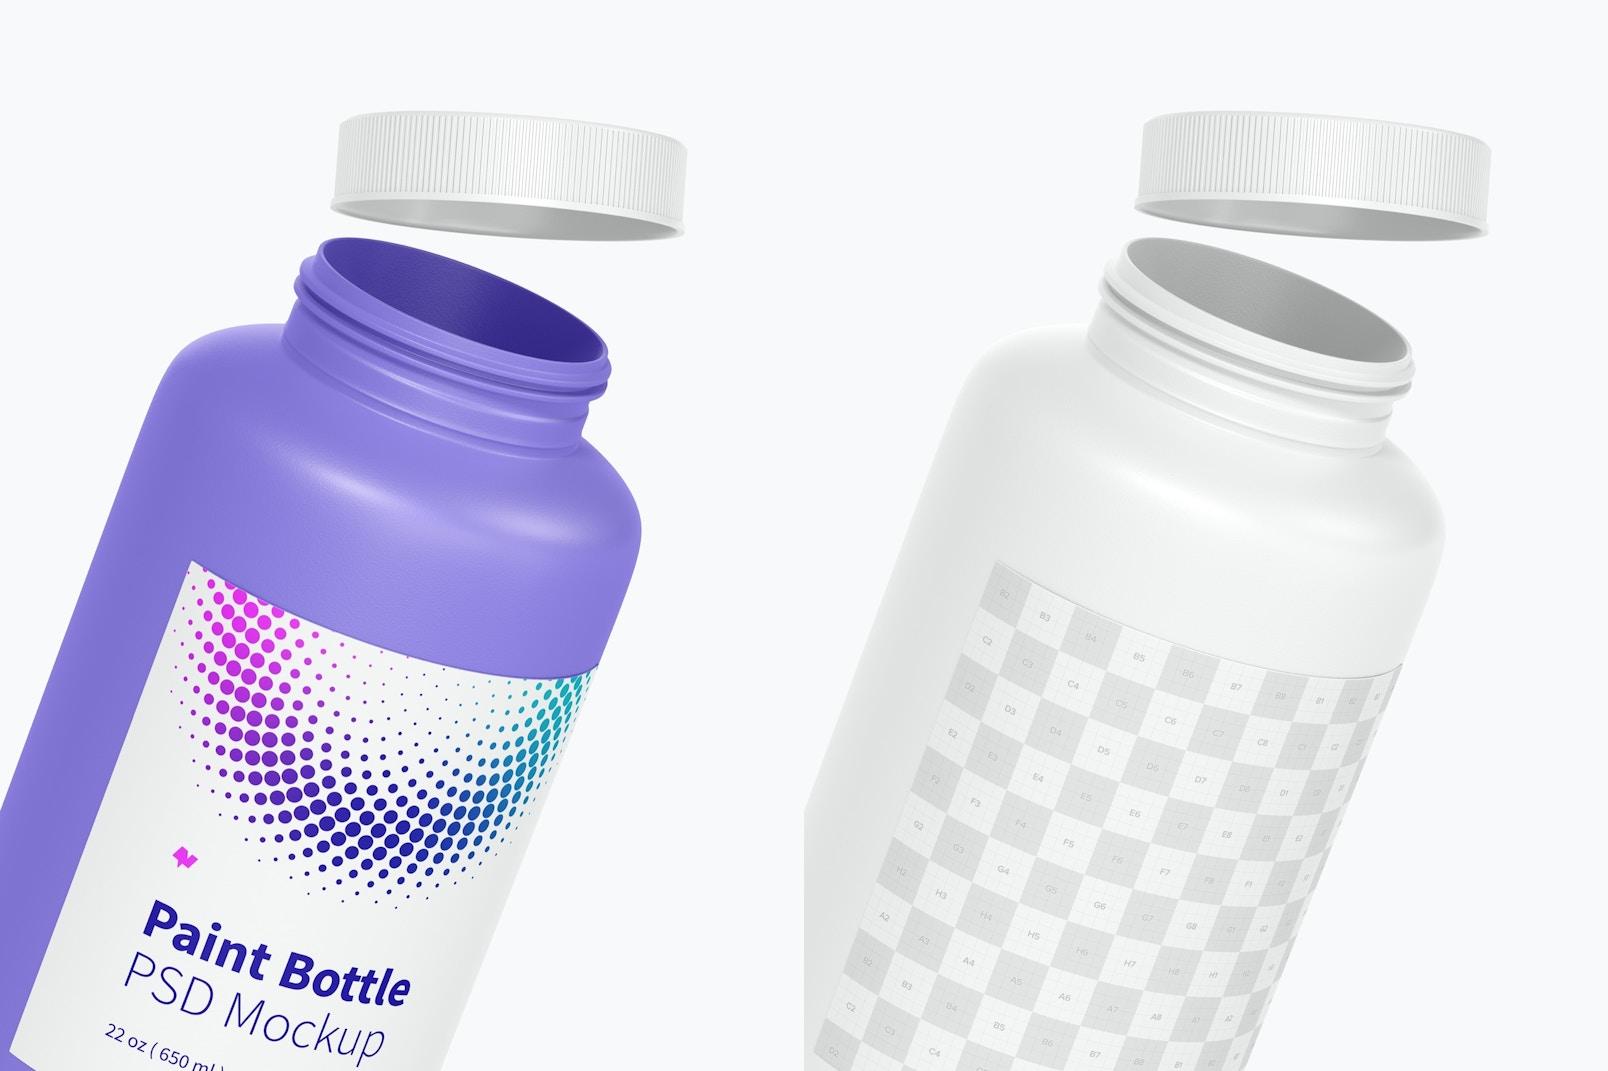 22 oz Paint Bottle Mockup, Close Up